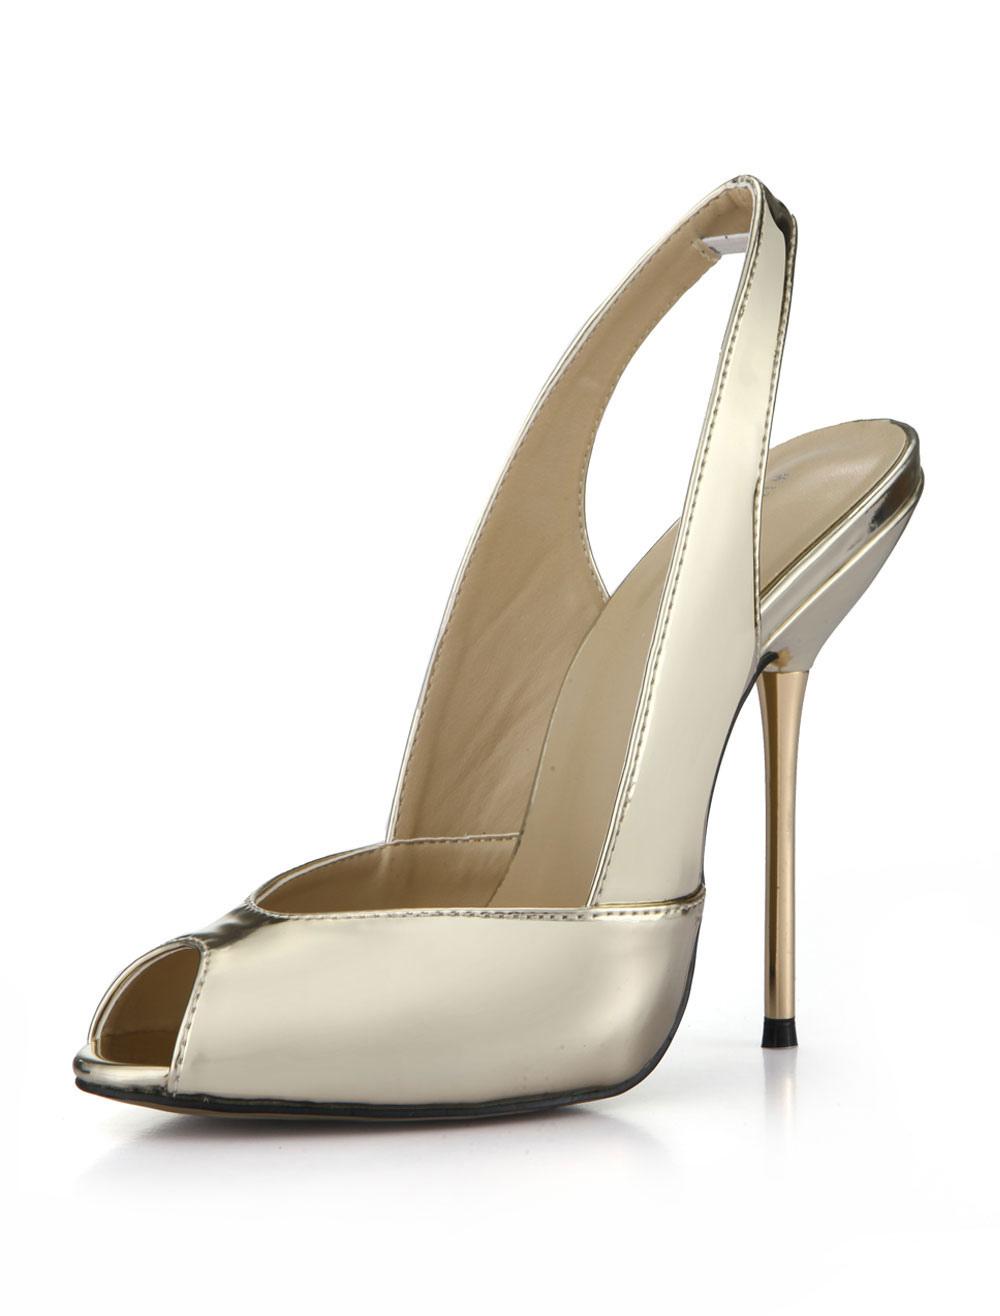 Women High Heels Peep Toe Slip On Slingbacks Gold Pumps